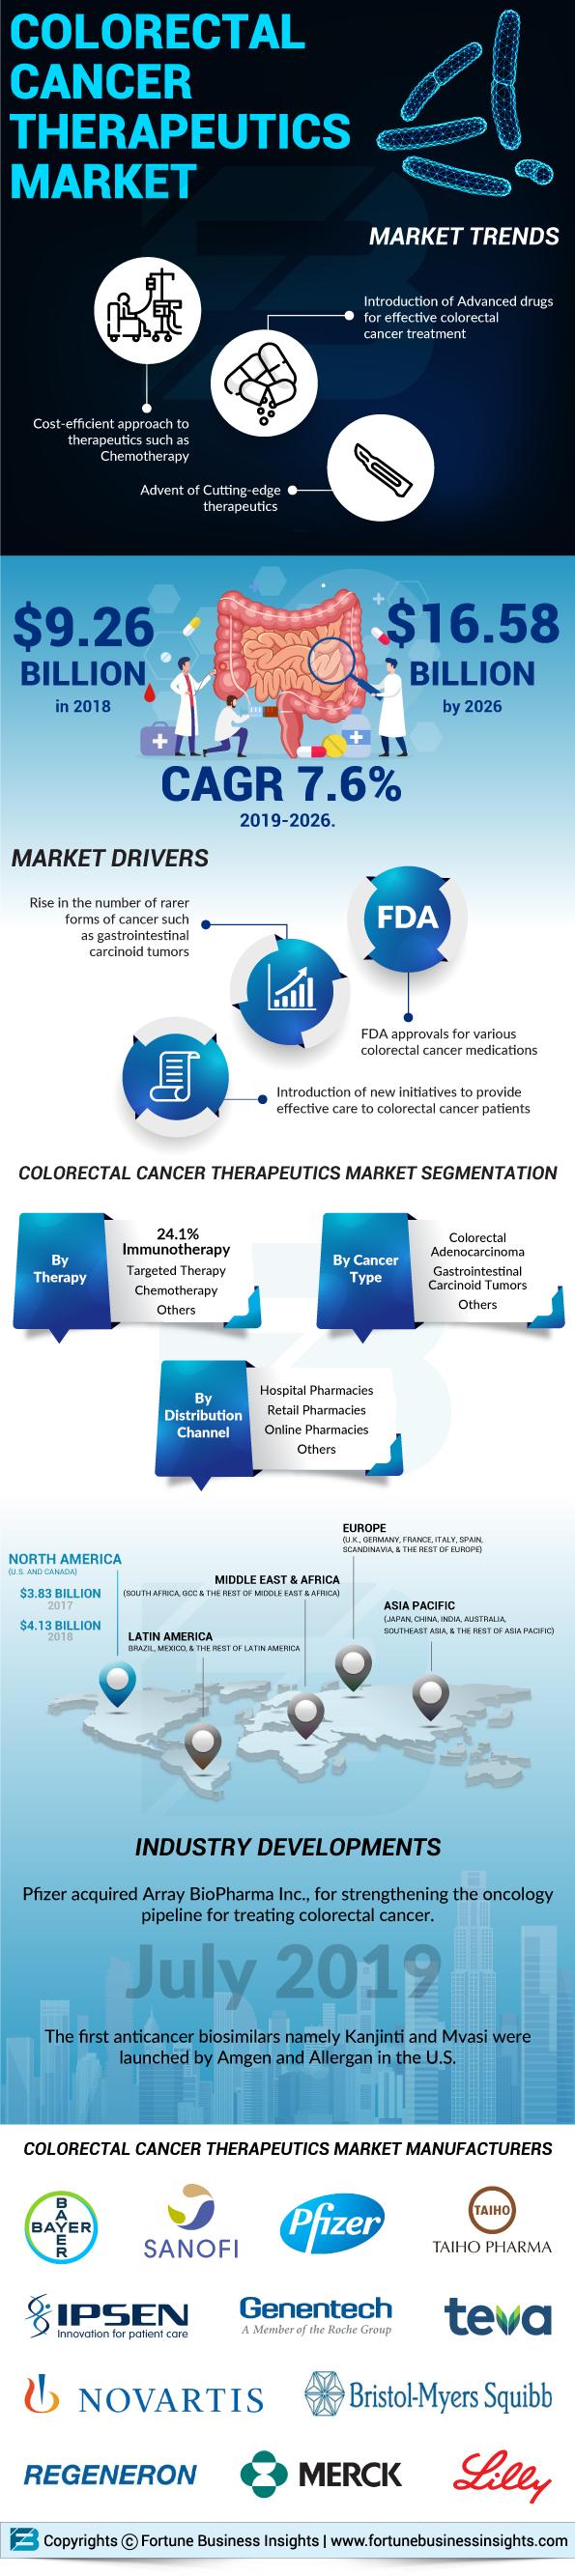 Colorectal Cancer Therapeutics Market